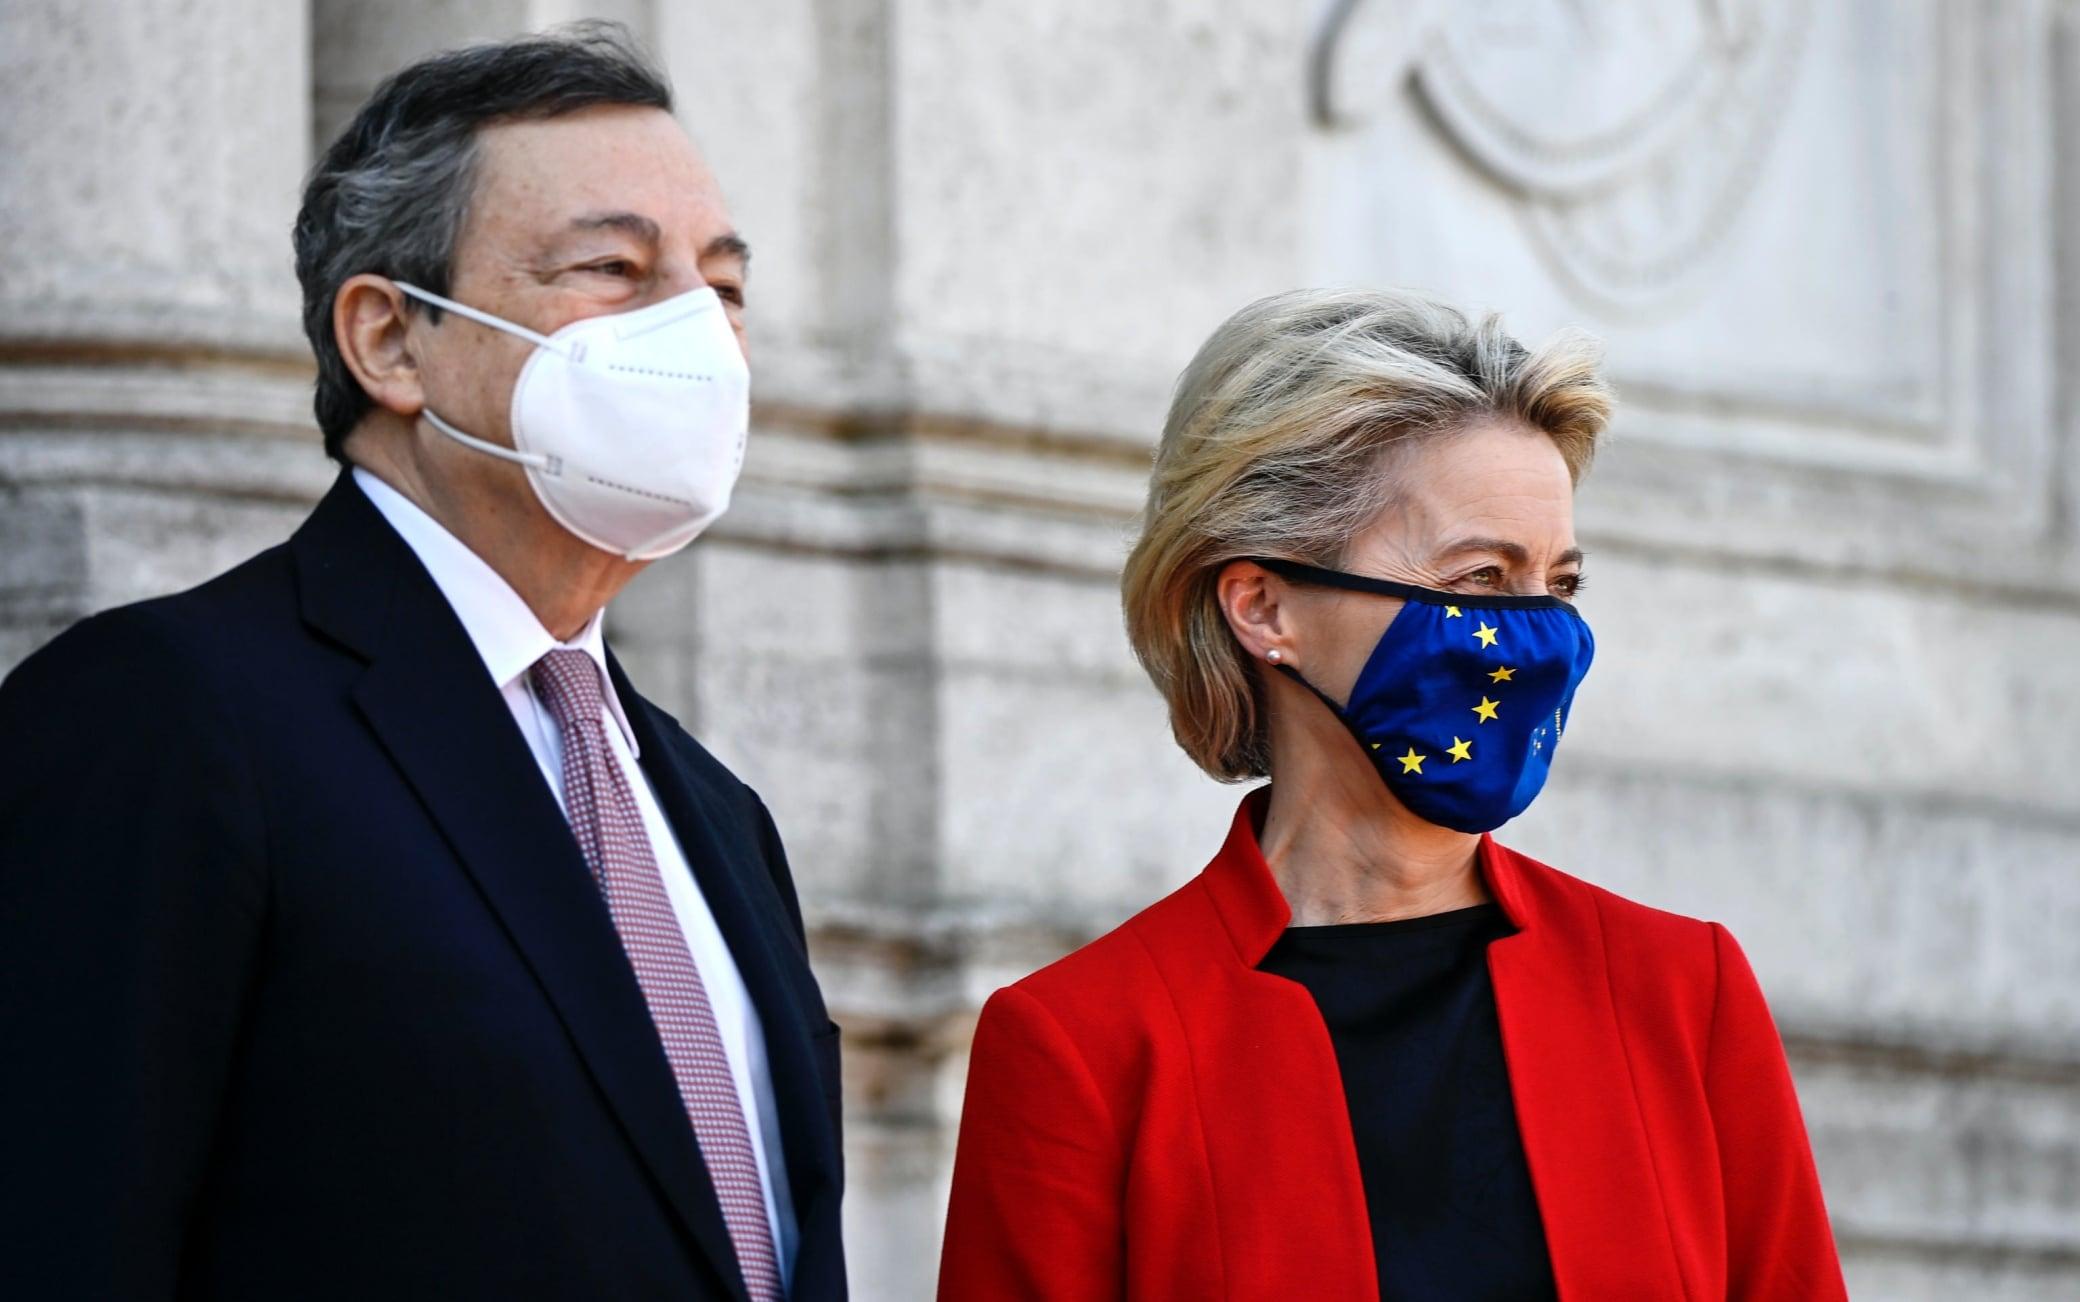 Mario Draghi e Ursula von der Leyen al Global Health Summit a Roma